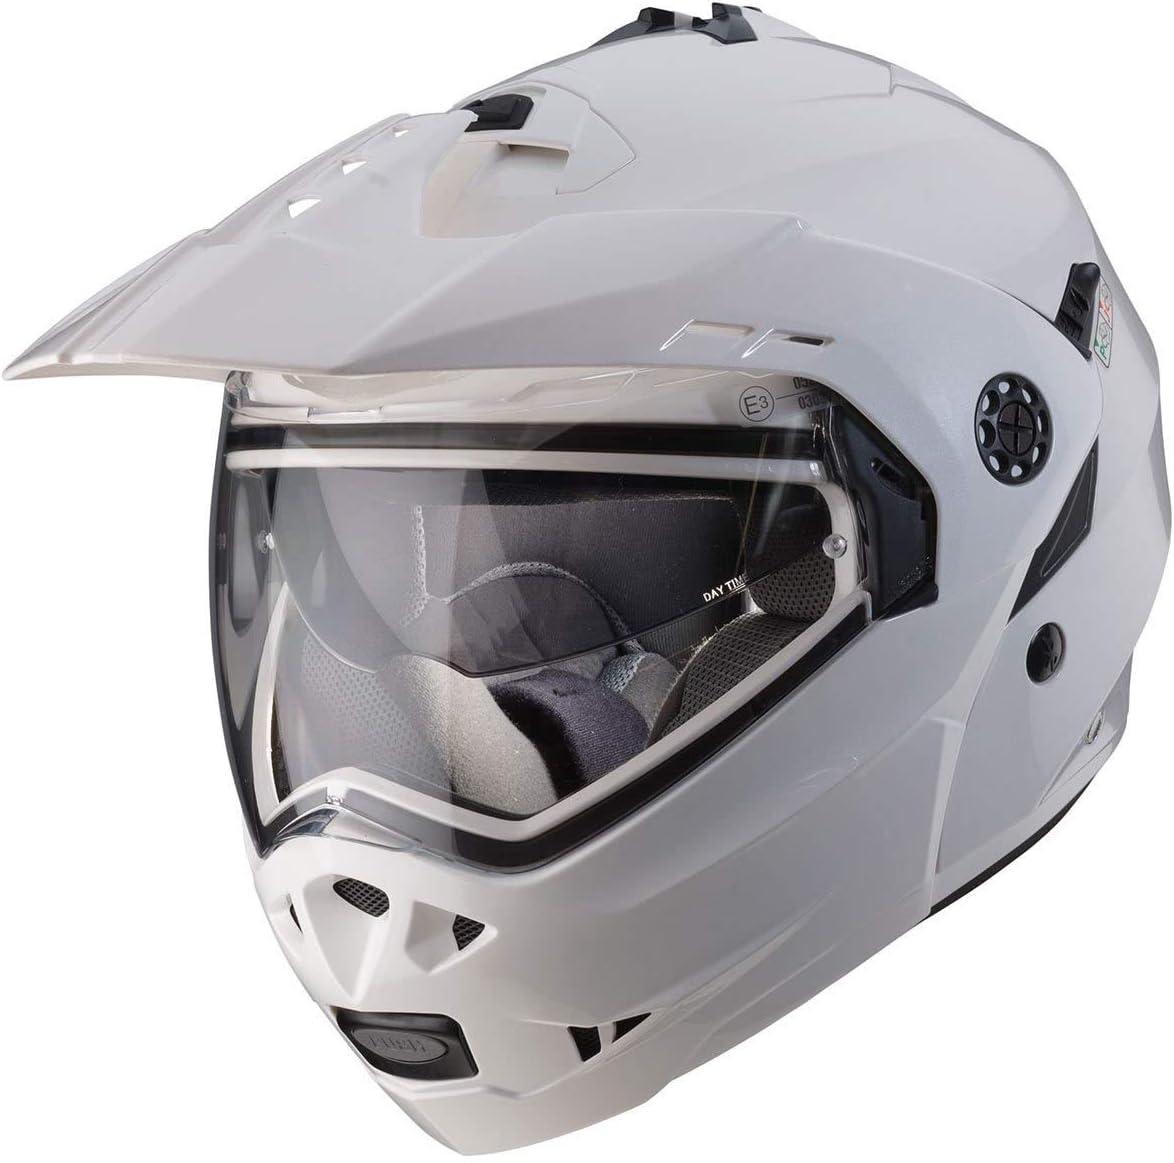 Metall Wei/ß Neue Caberg Tourmax Helm 2015